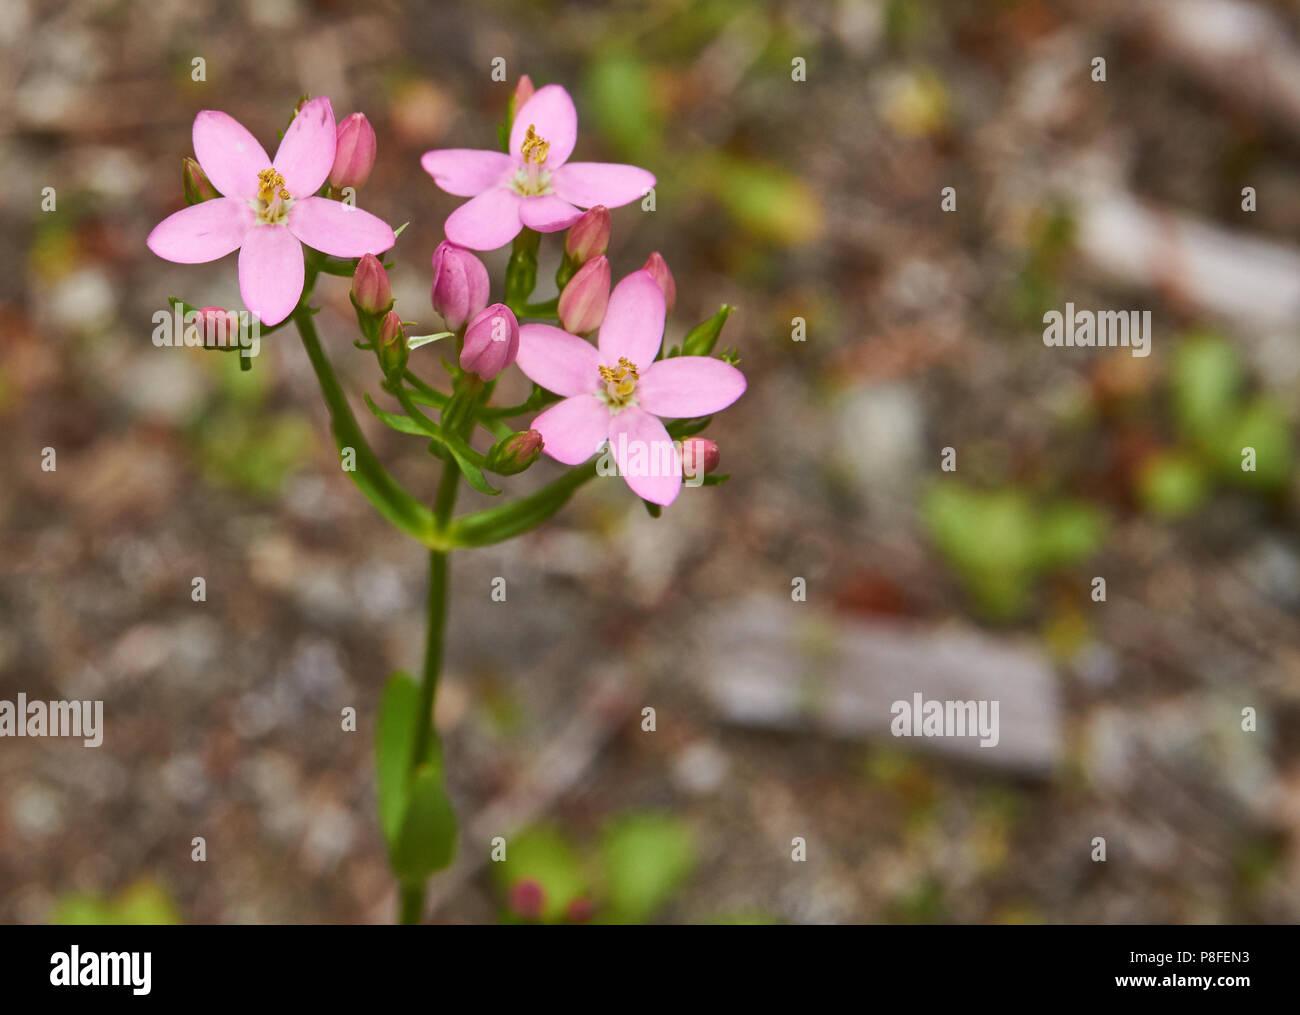 Has tiny pink flowers stock photos has tiny pink flowers stock tiny pink flowers stock image mightylinksfo